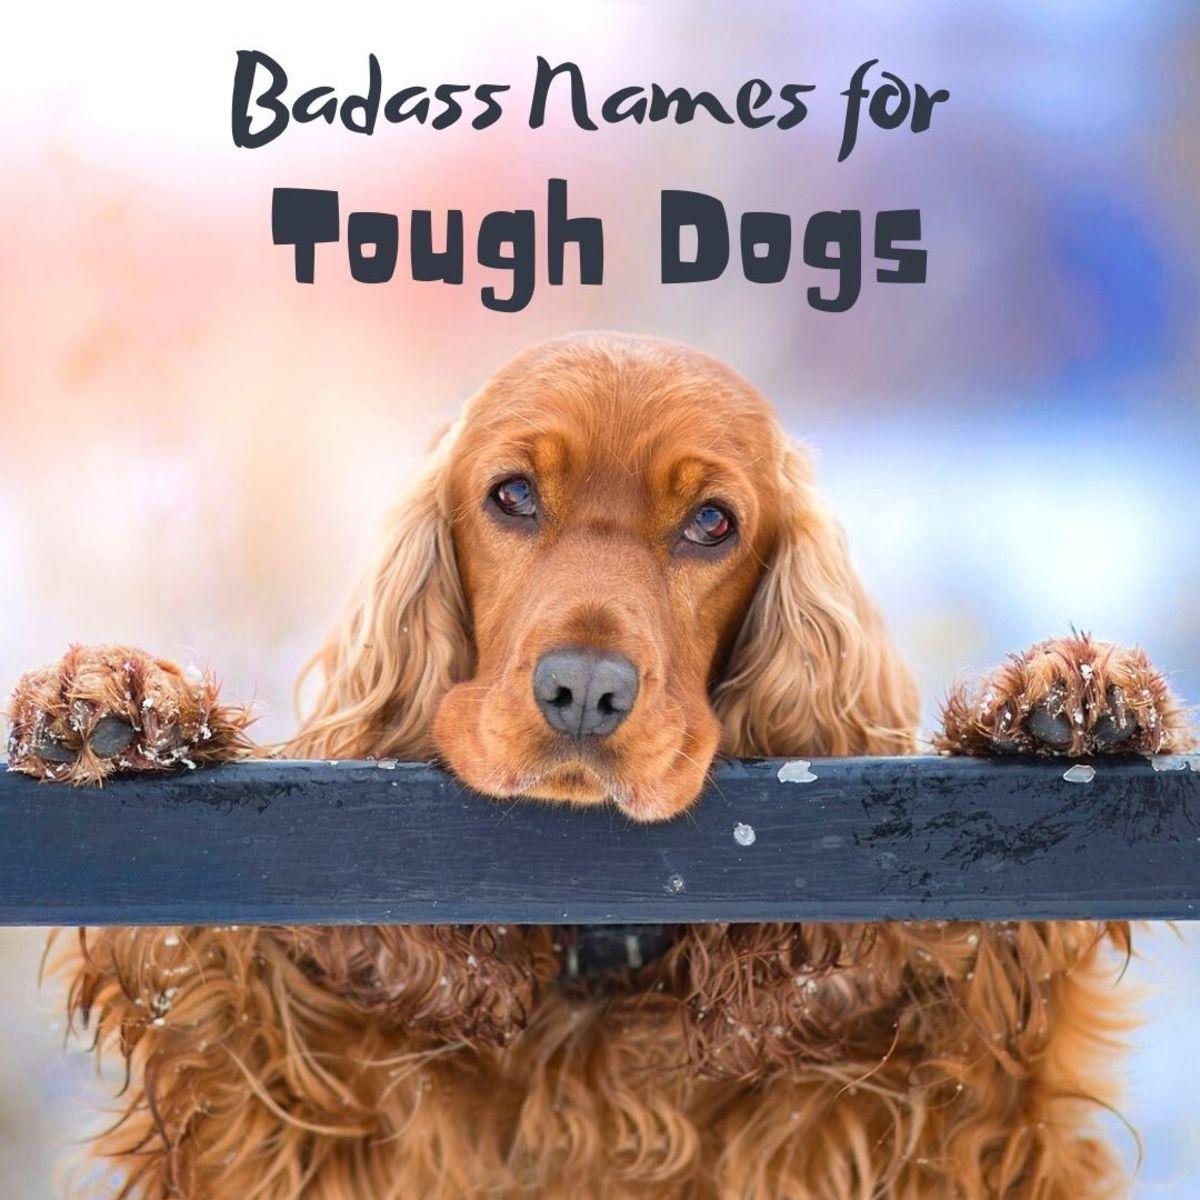 90+ Tough and Badass Dog Names: Outlaws and Gangstas